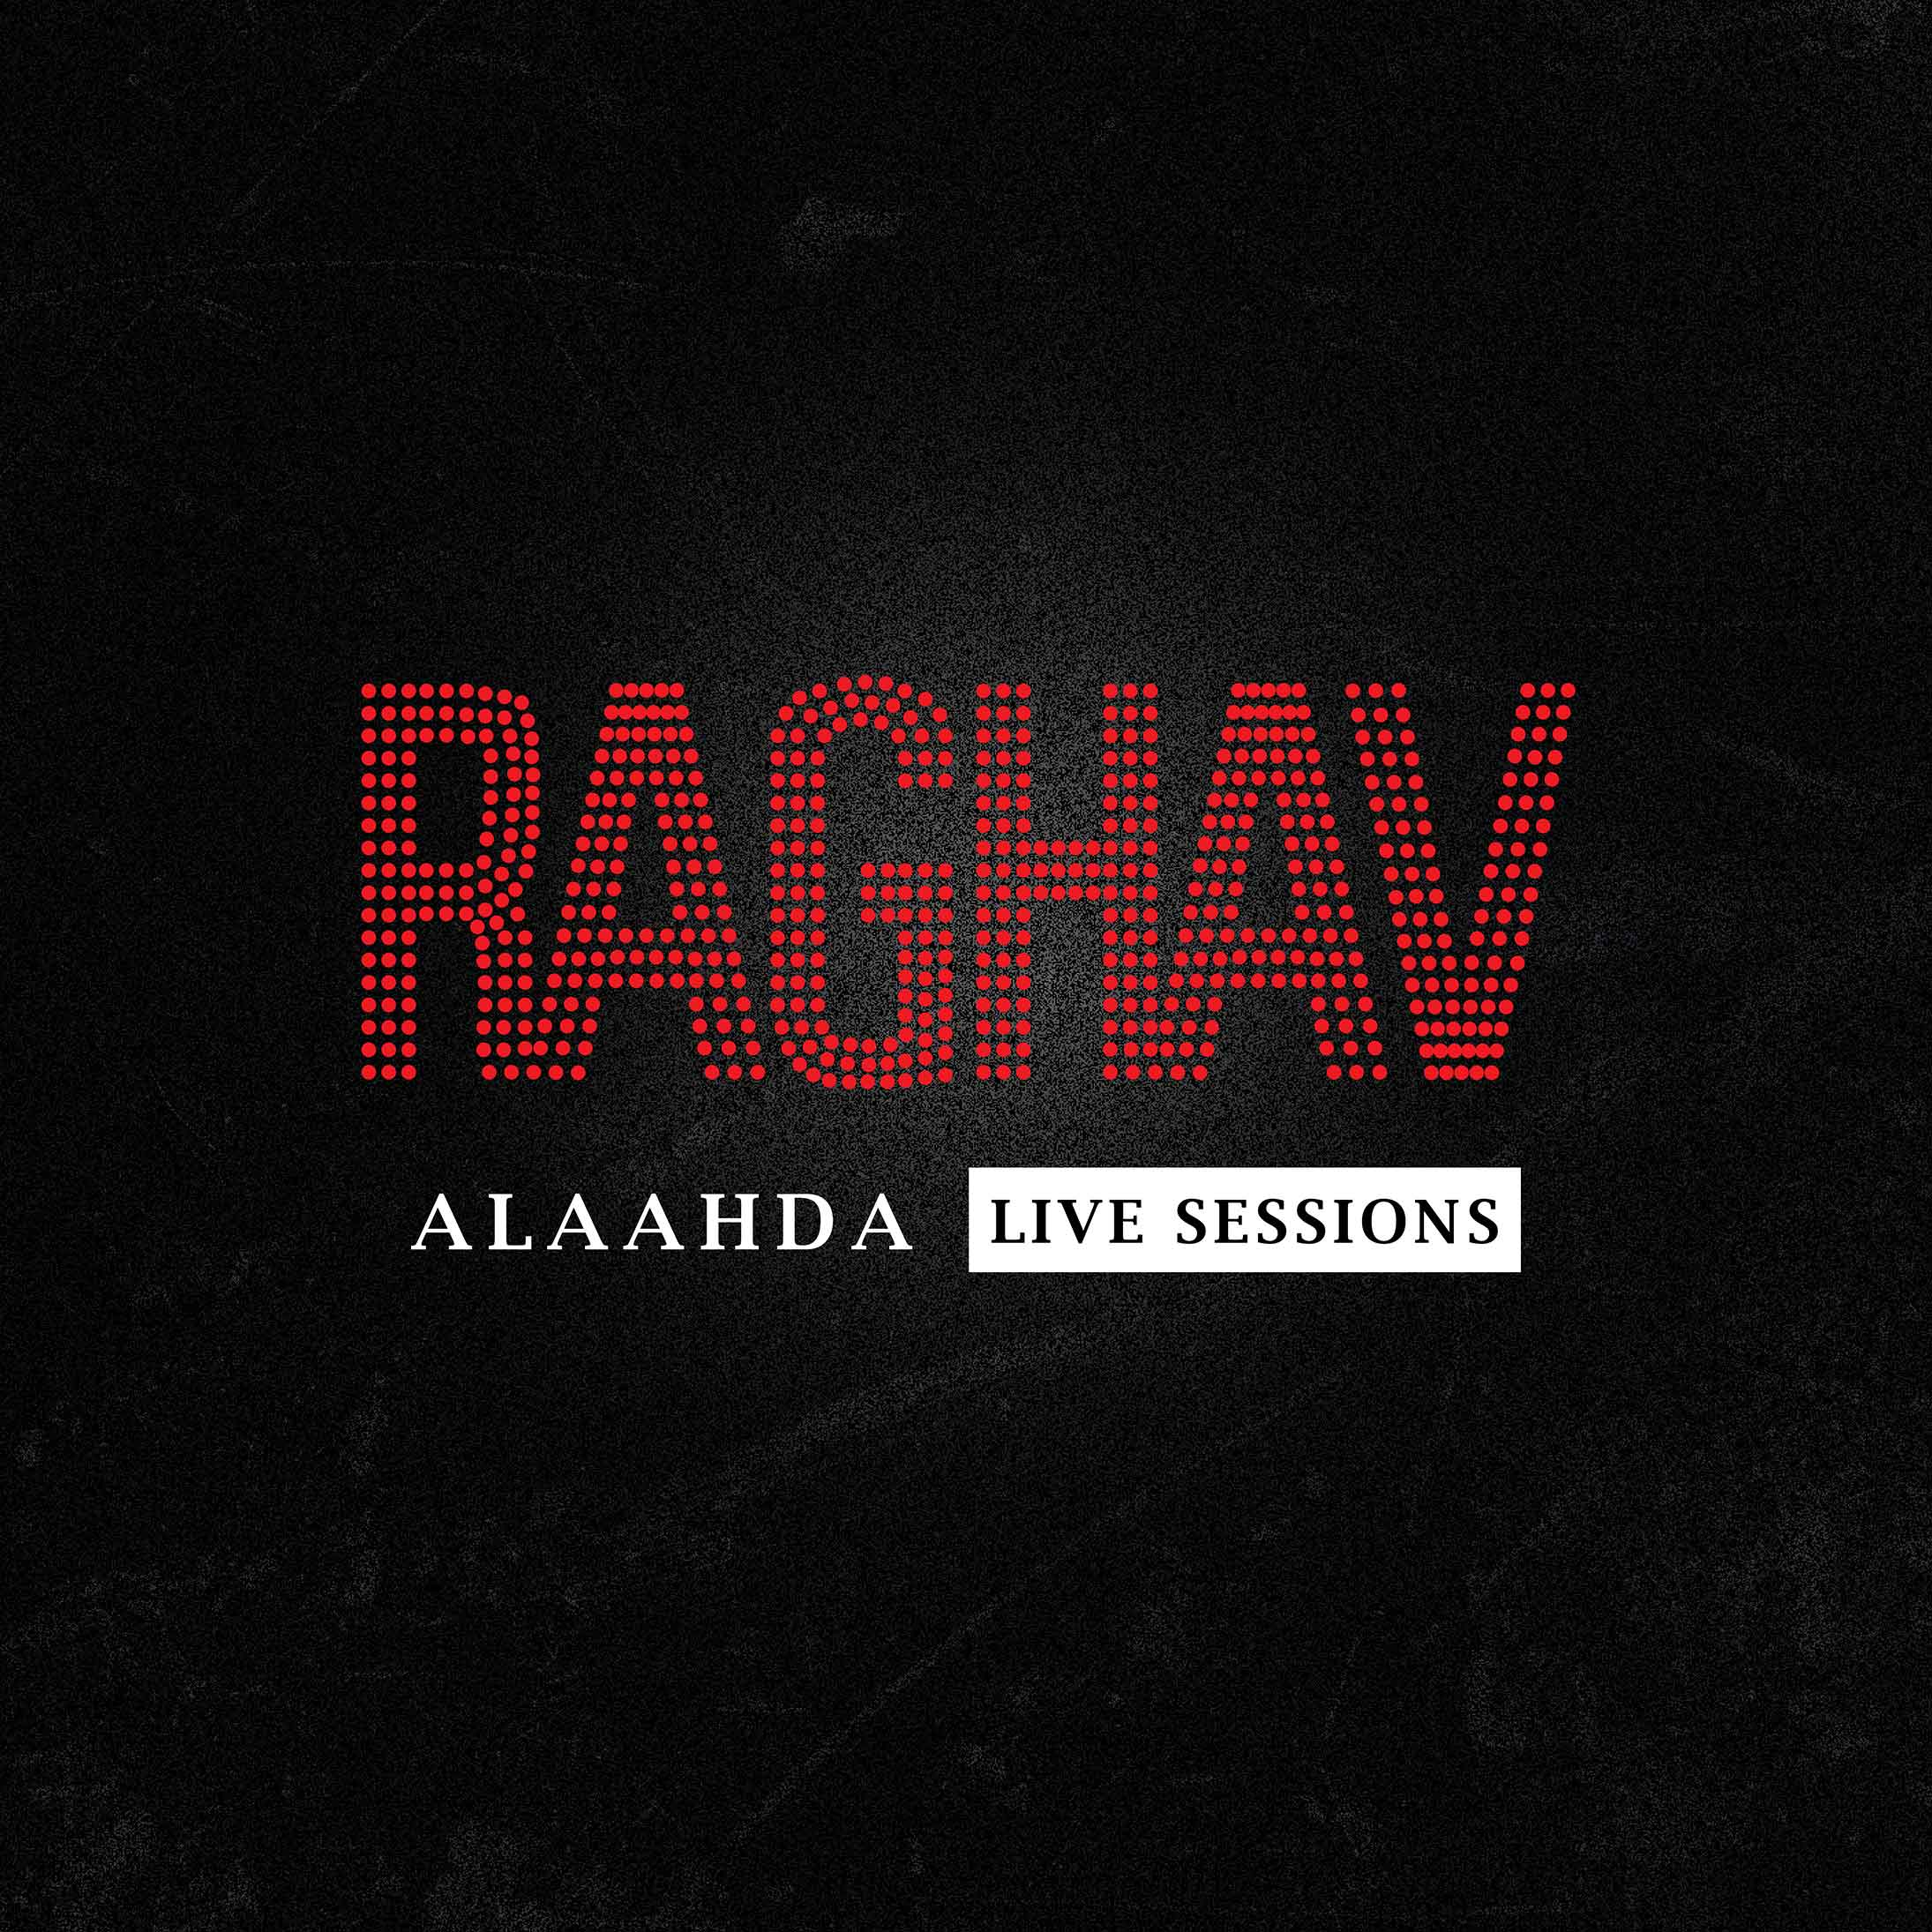 Raghav_LiveSessions_Alaahda.jpg